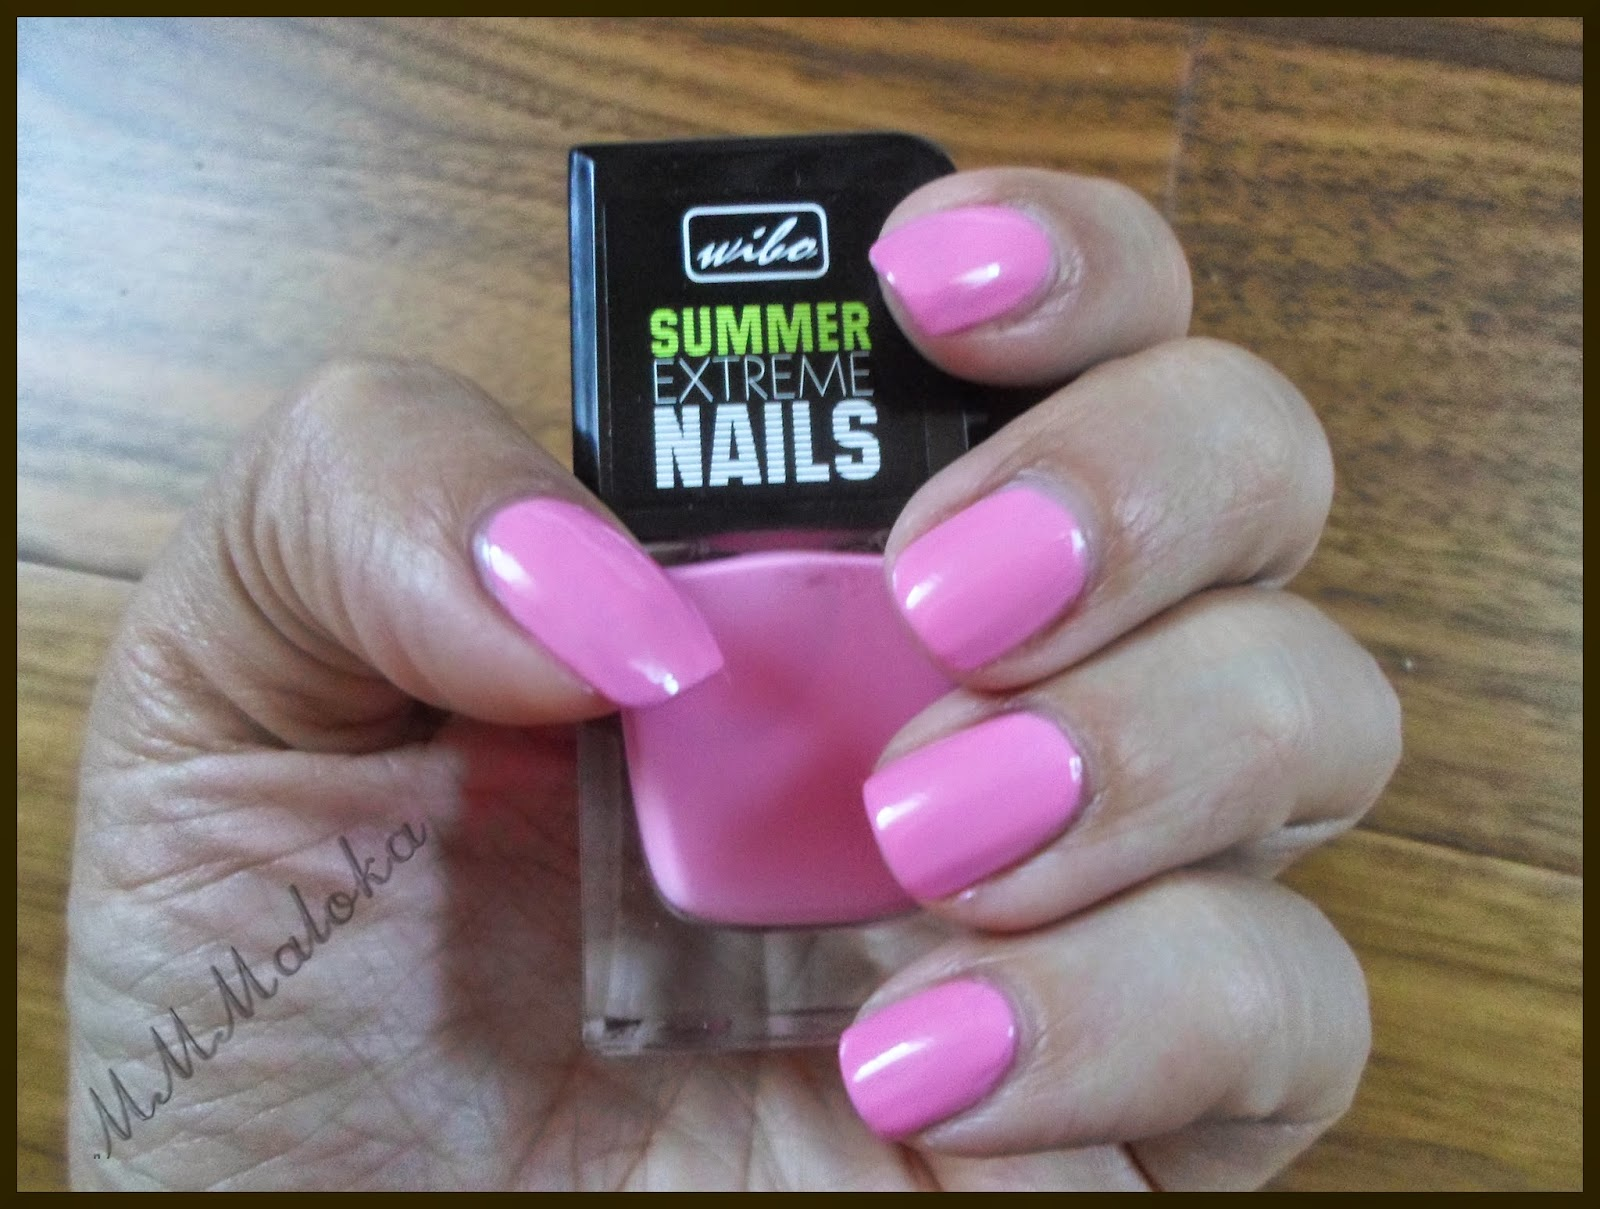 Summer Extreme Nails od Wibo